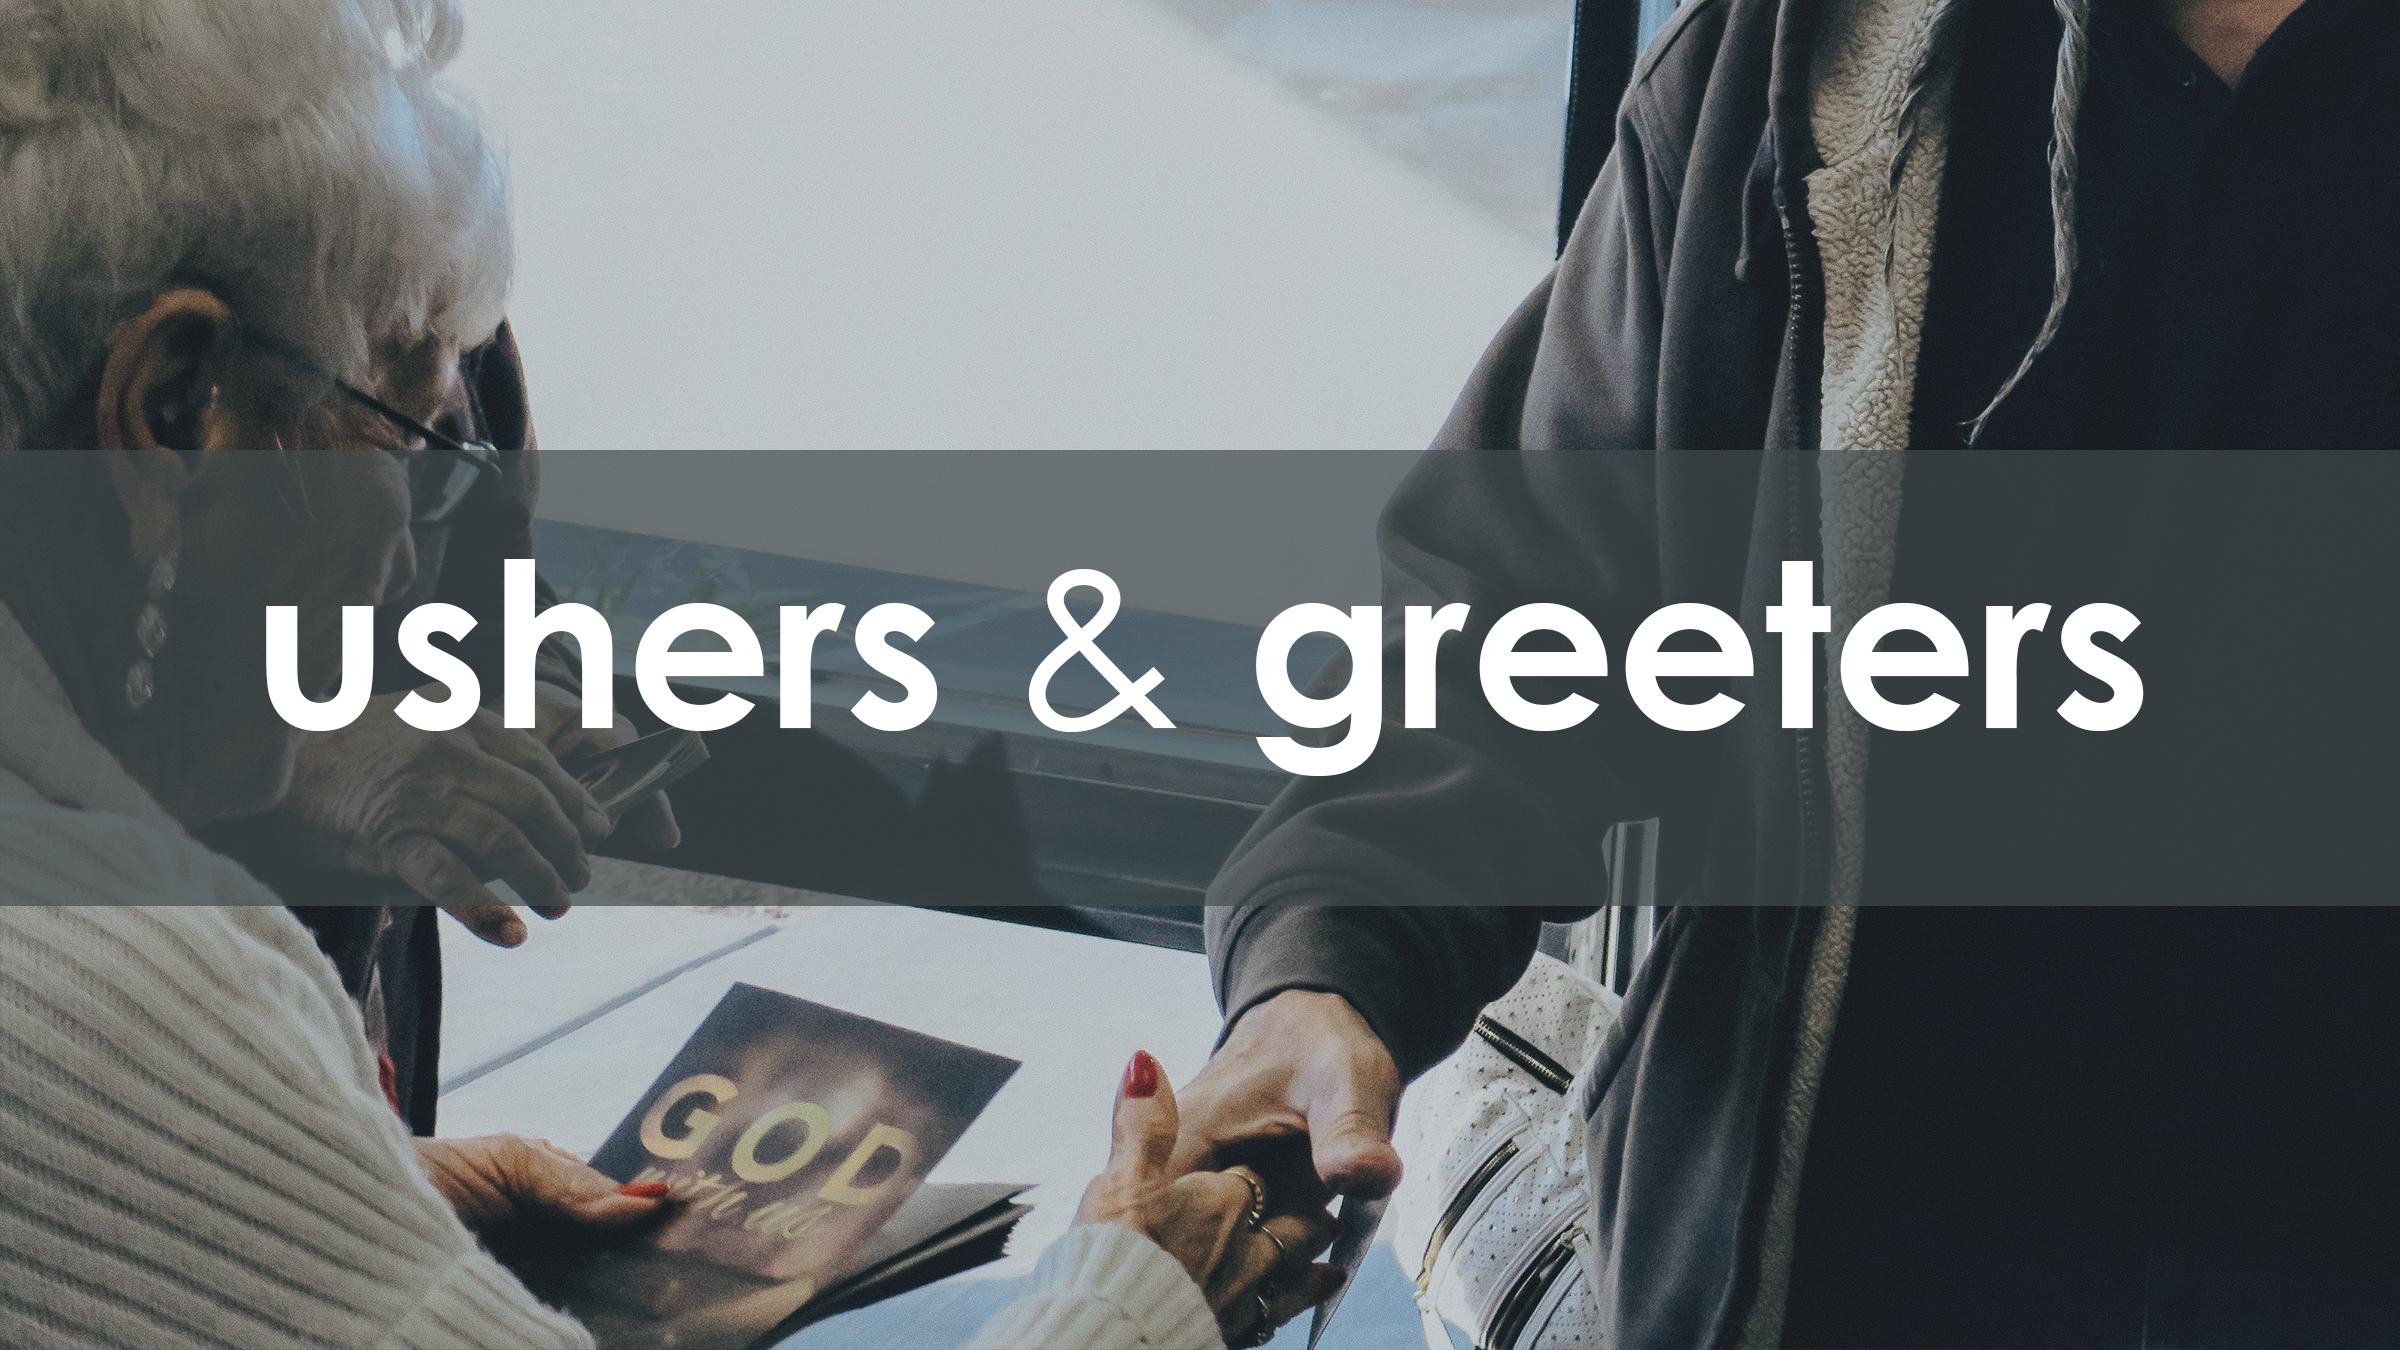 Ushers-and-greeters.jpg